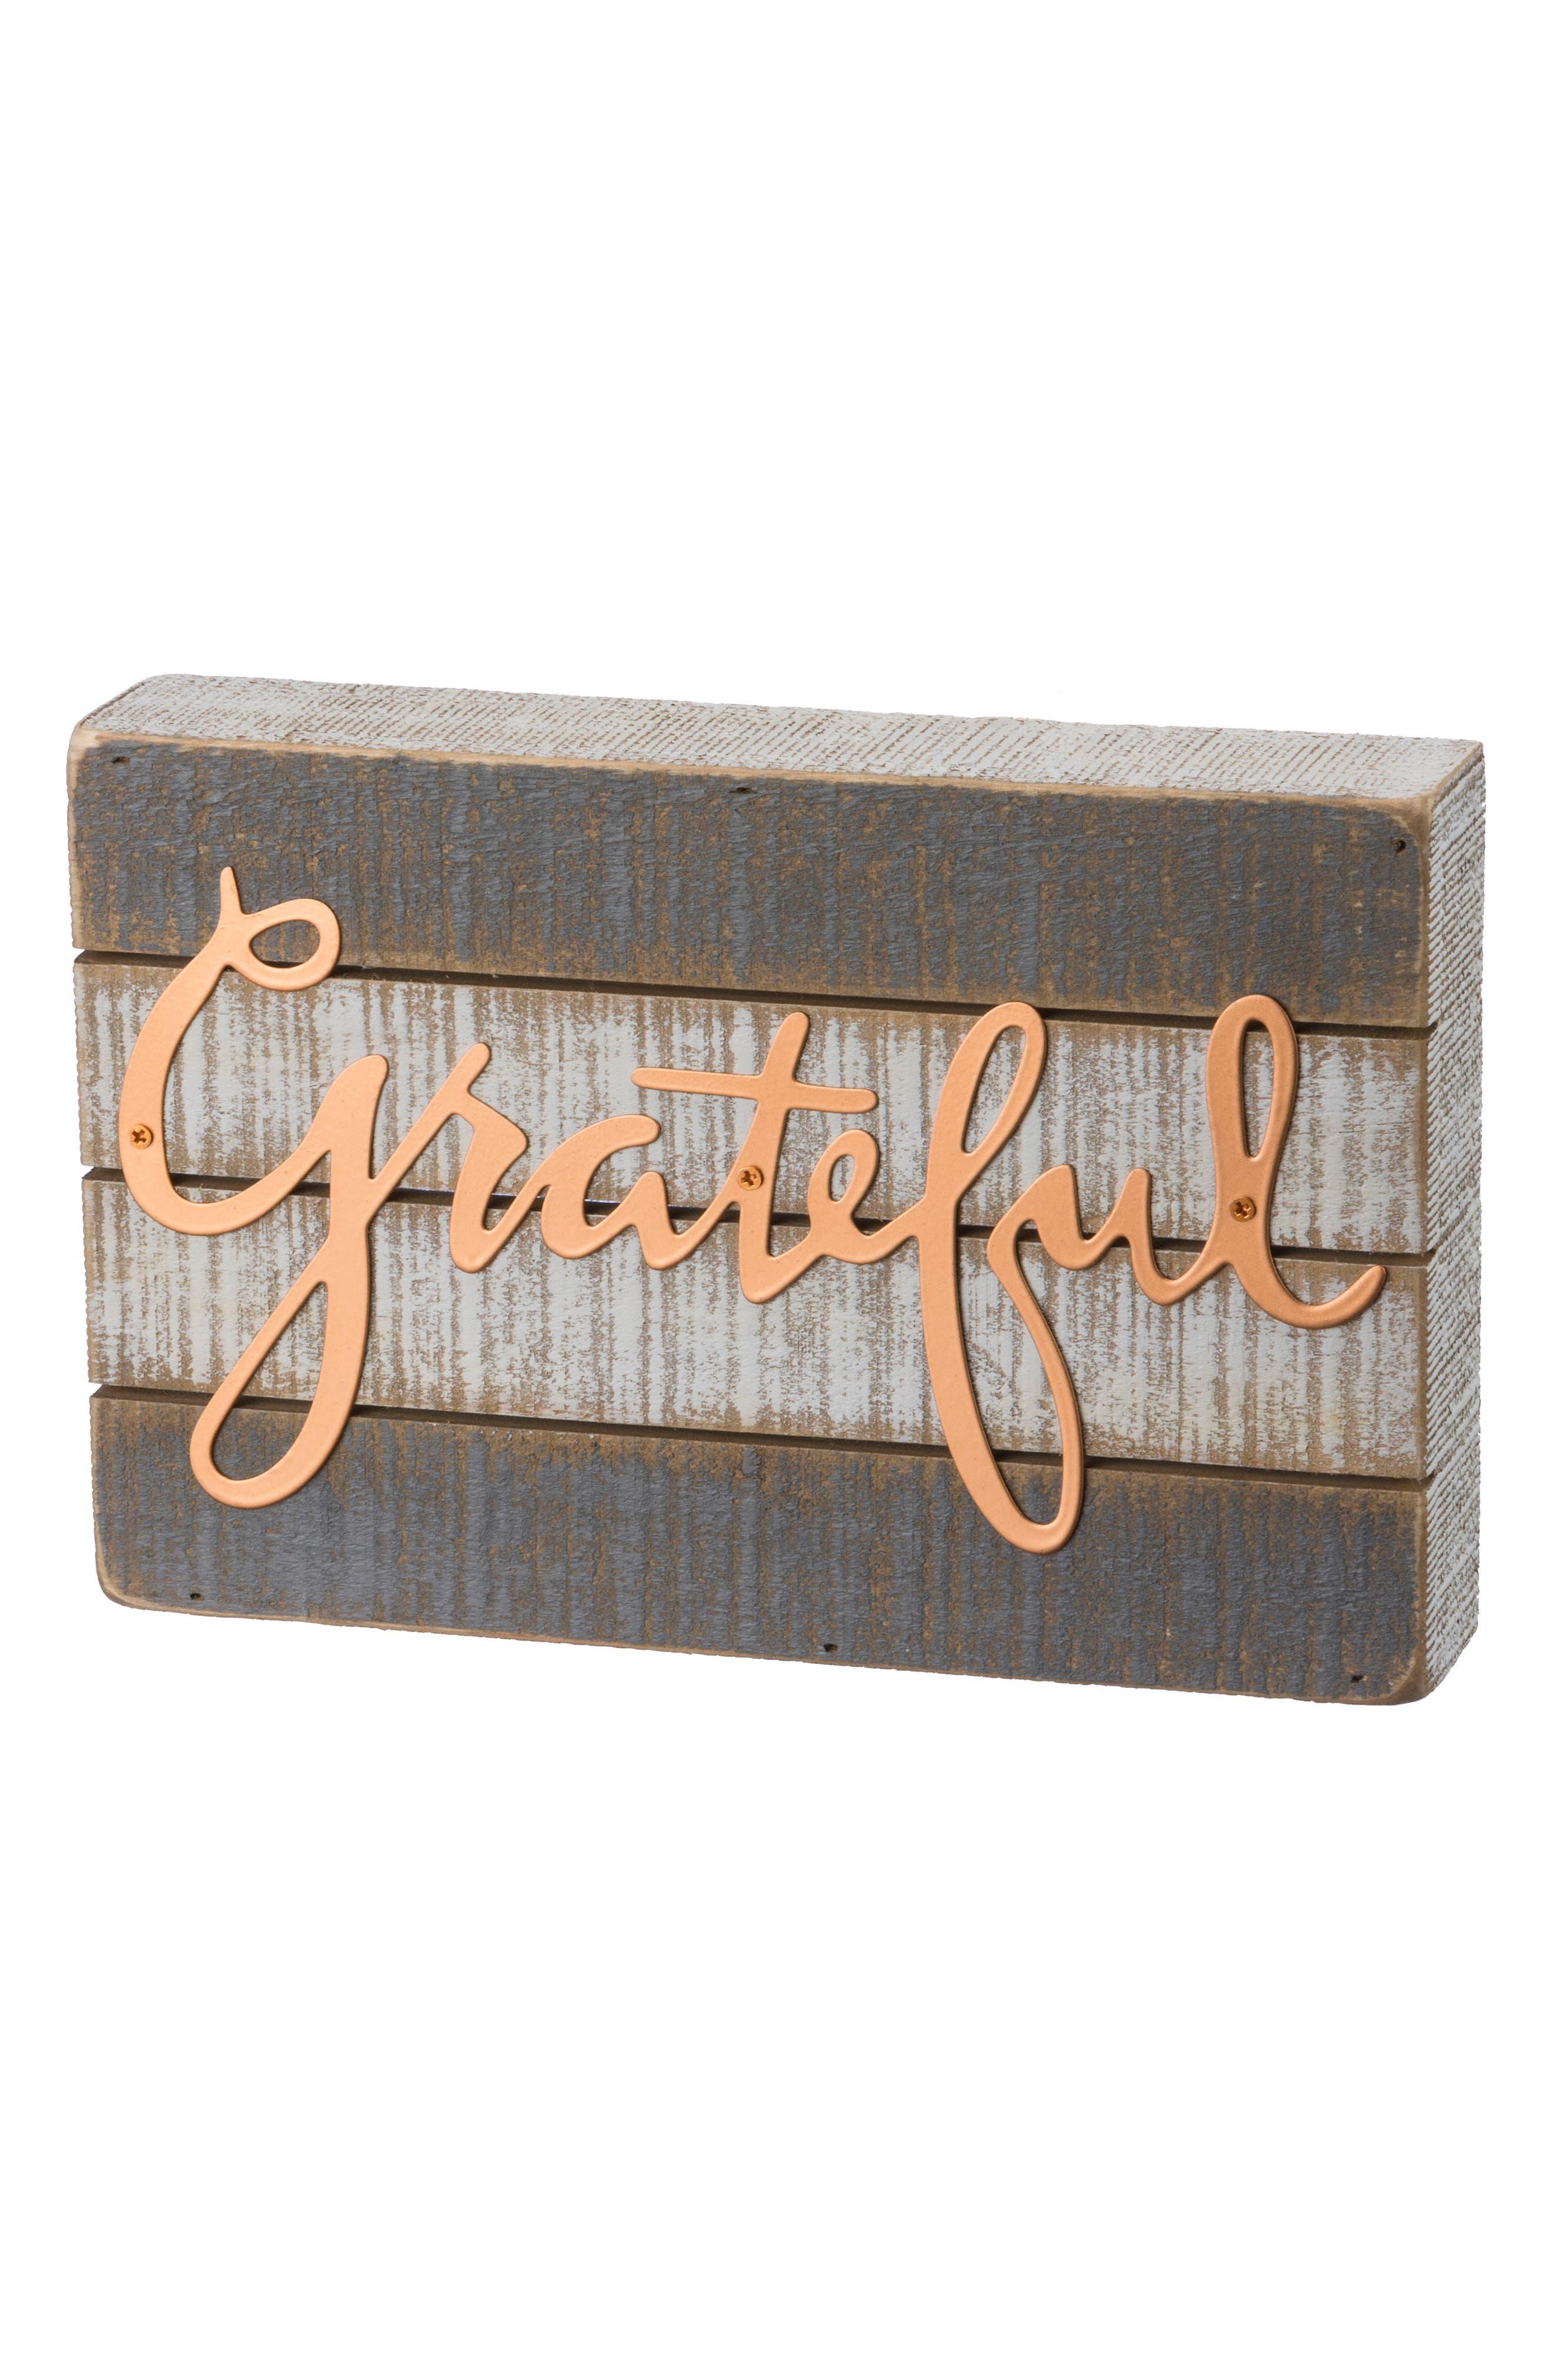 Main Image - Primitives by Kathy Grateful Wood Box Sign